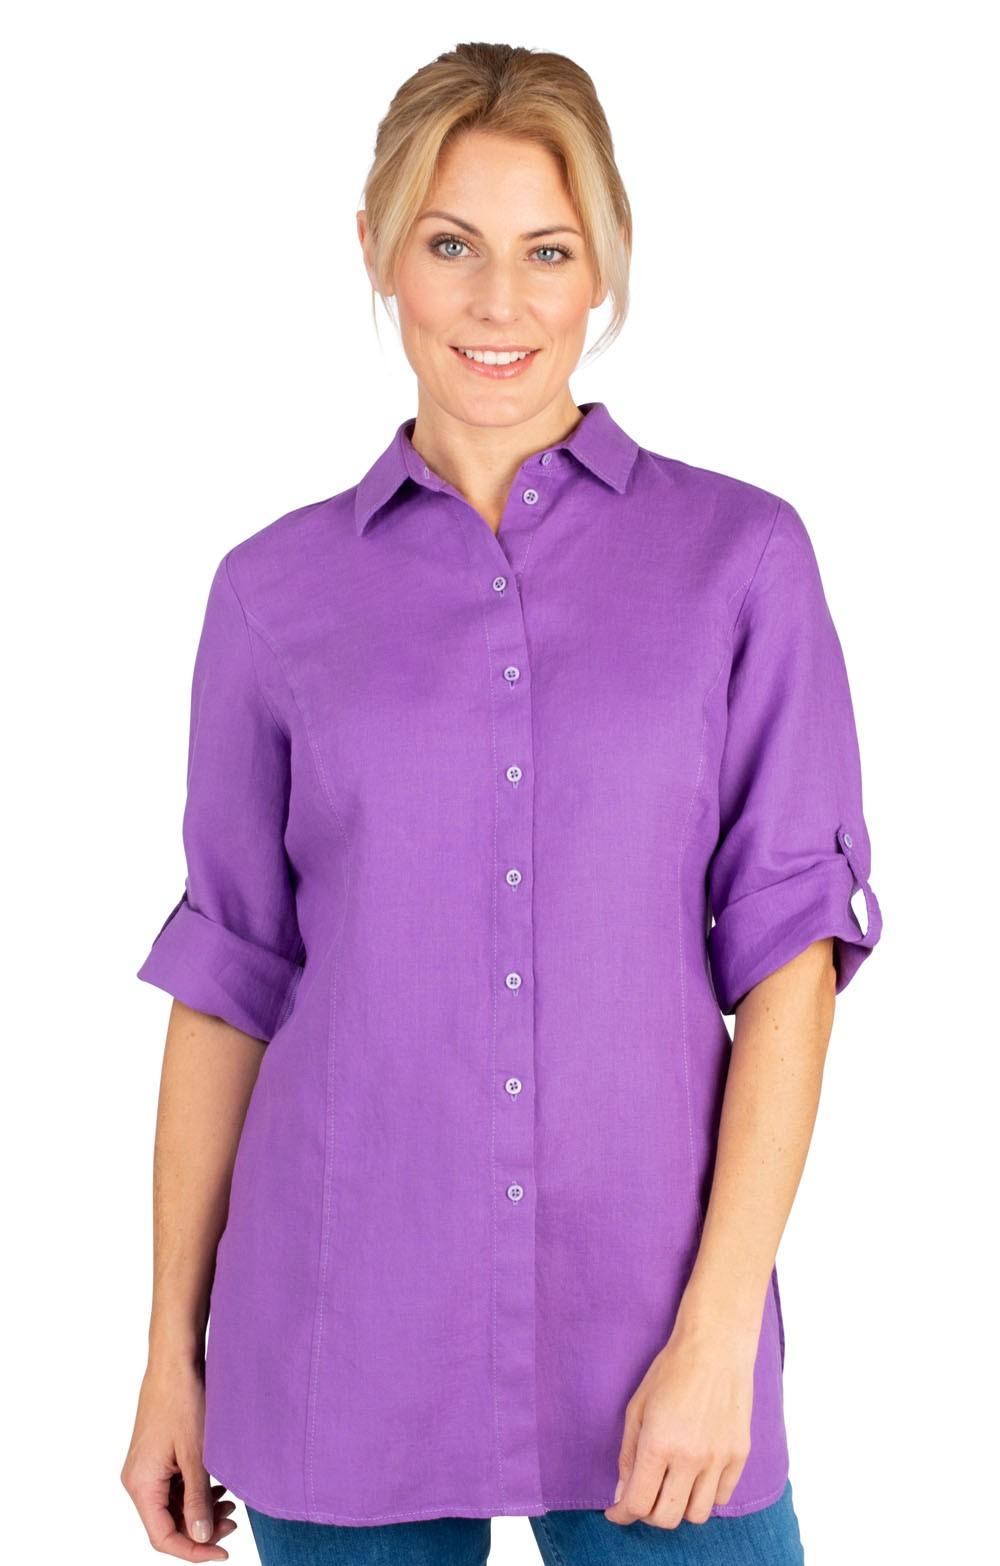 ec99558625bef0 Ladies Erfo Long Linen Shirt - House of Bruar